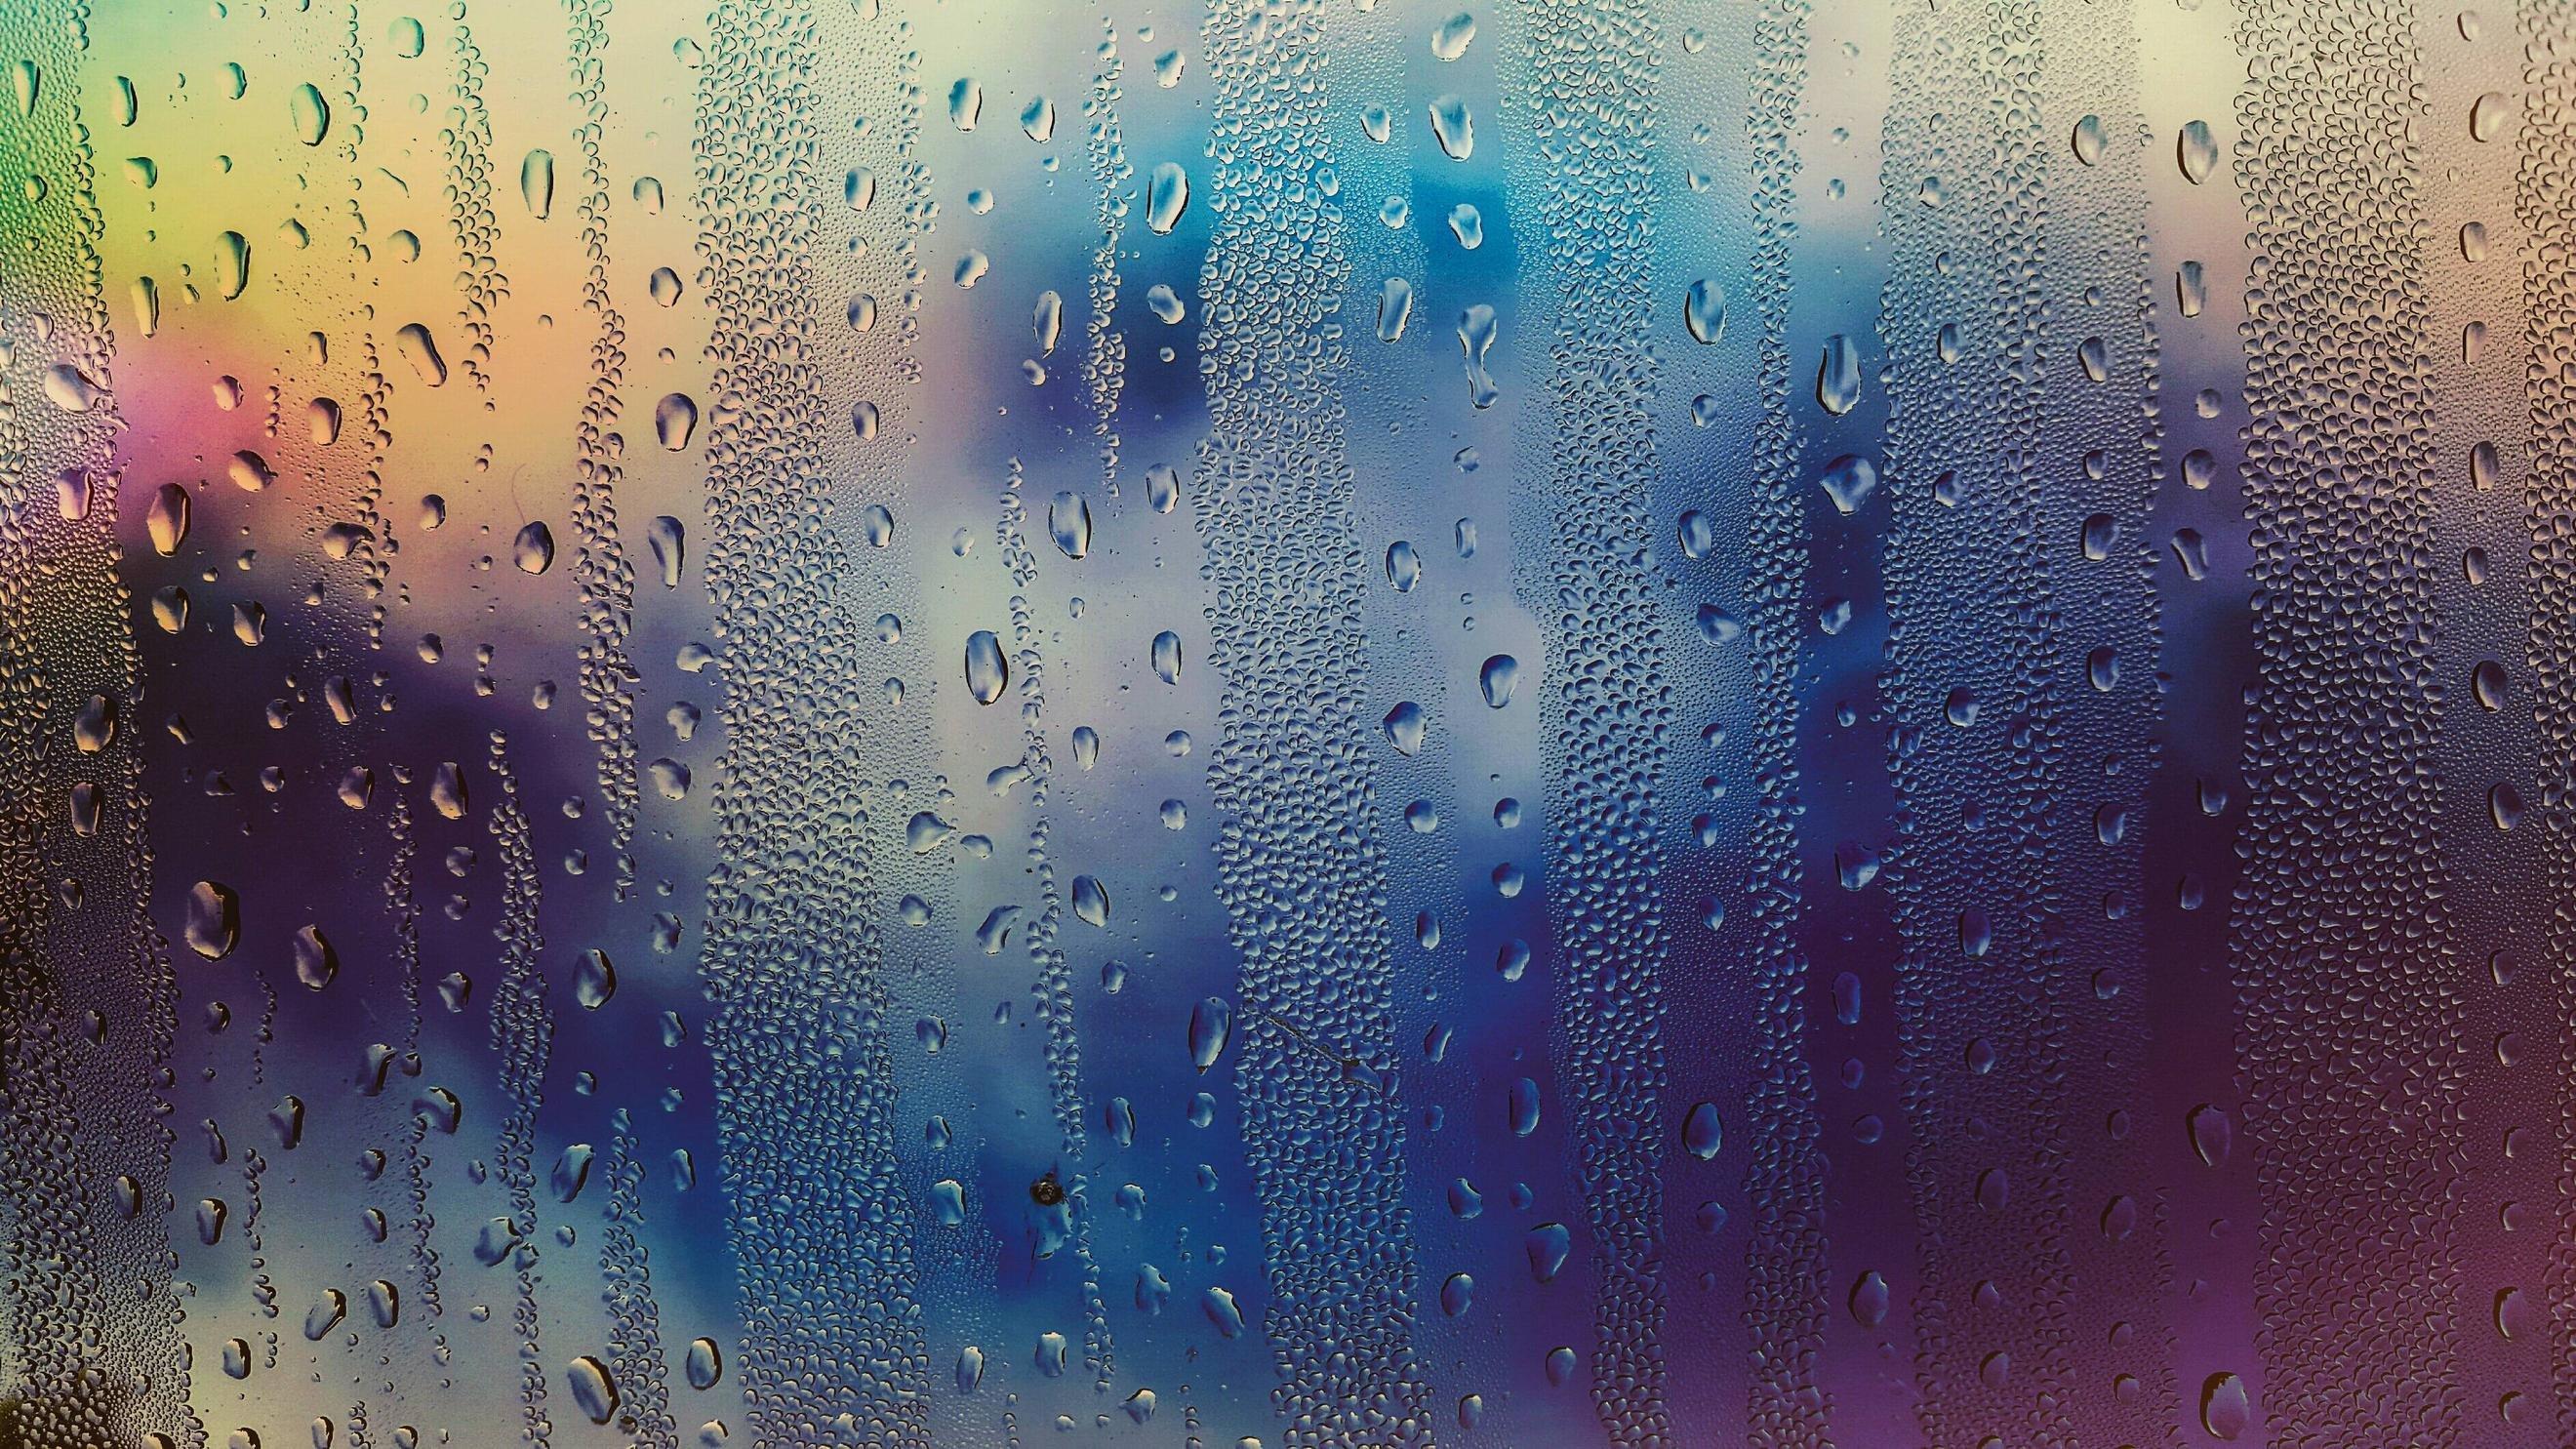 Rain Wallpapers Photos And Desktop Backgrounds Up To 8k